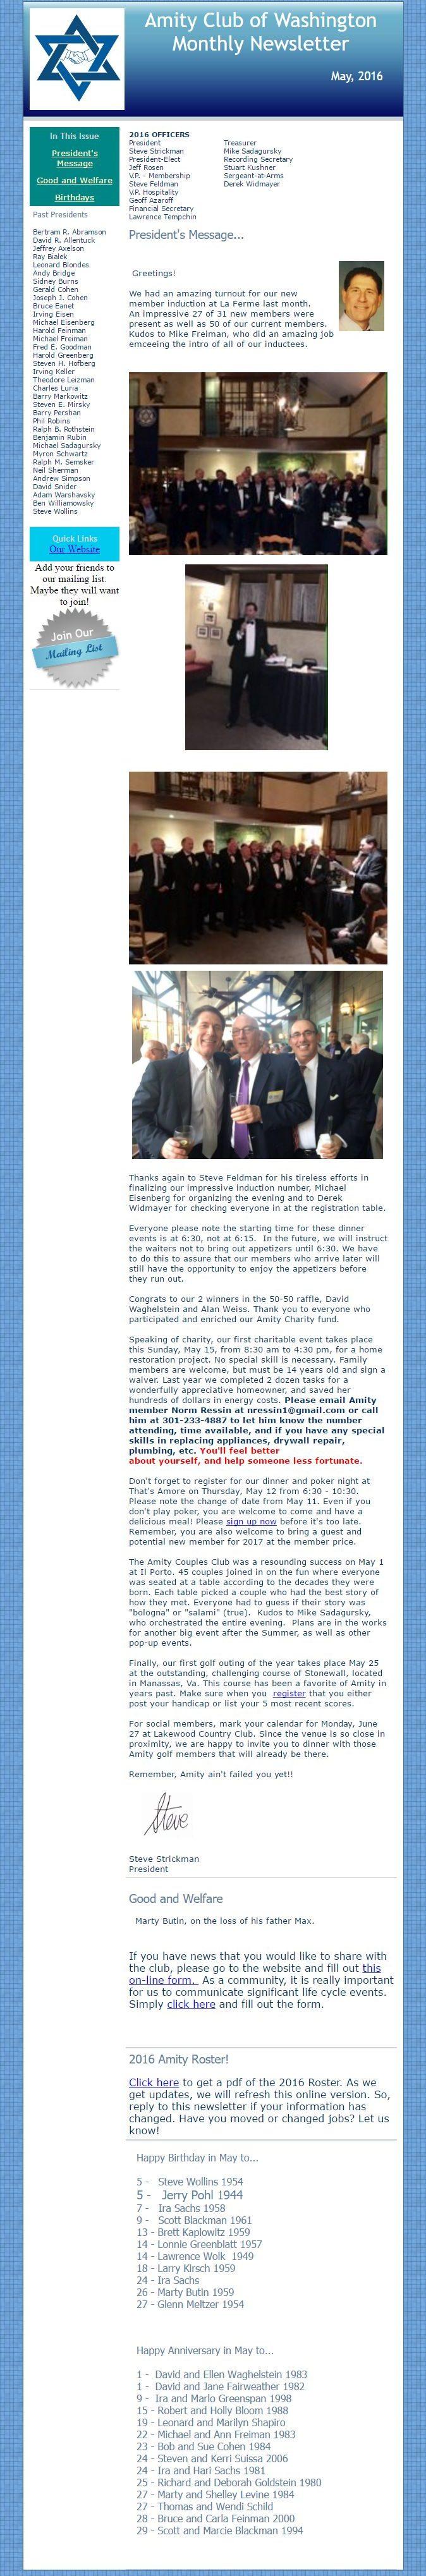 May 2016 Amity Club of Washington Newsletter